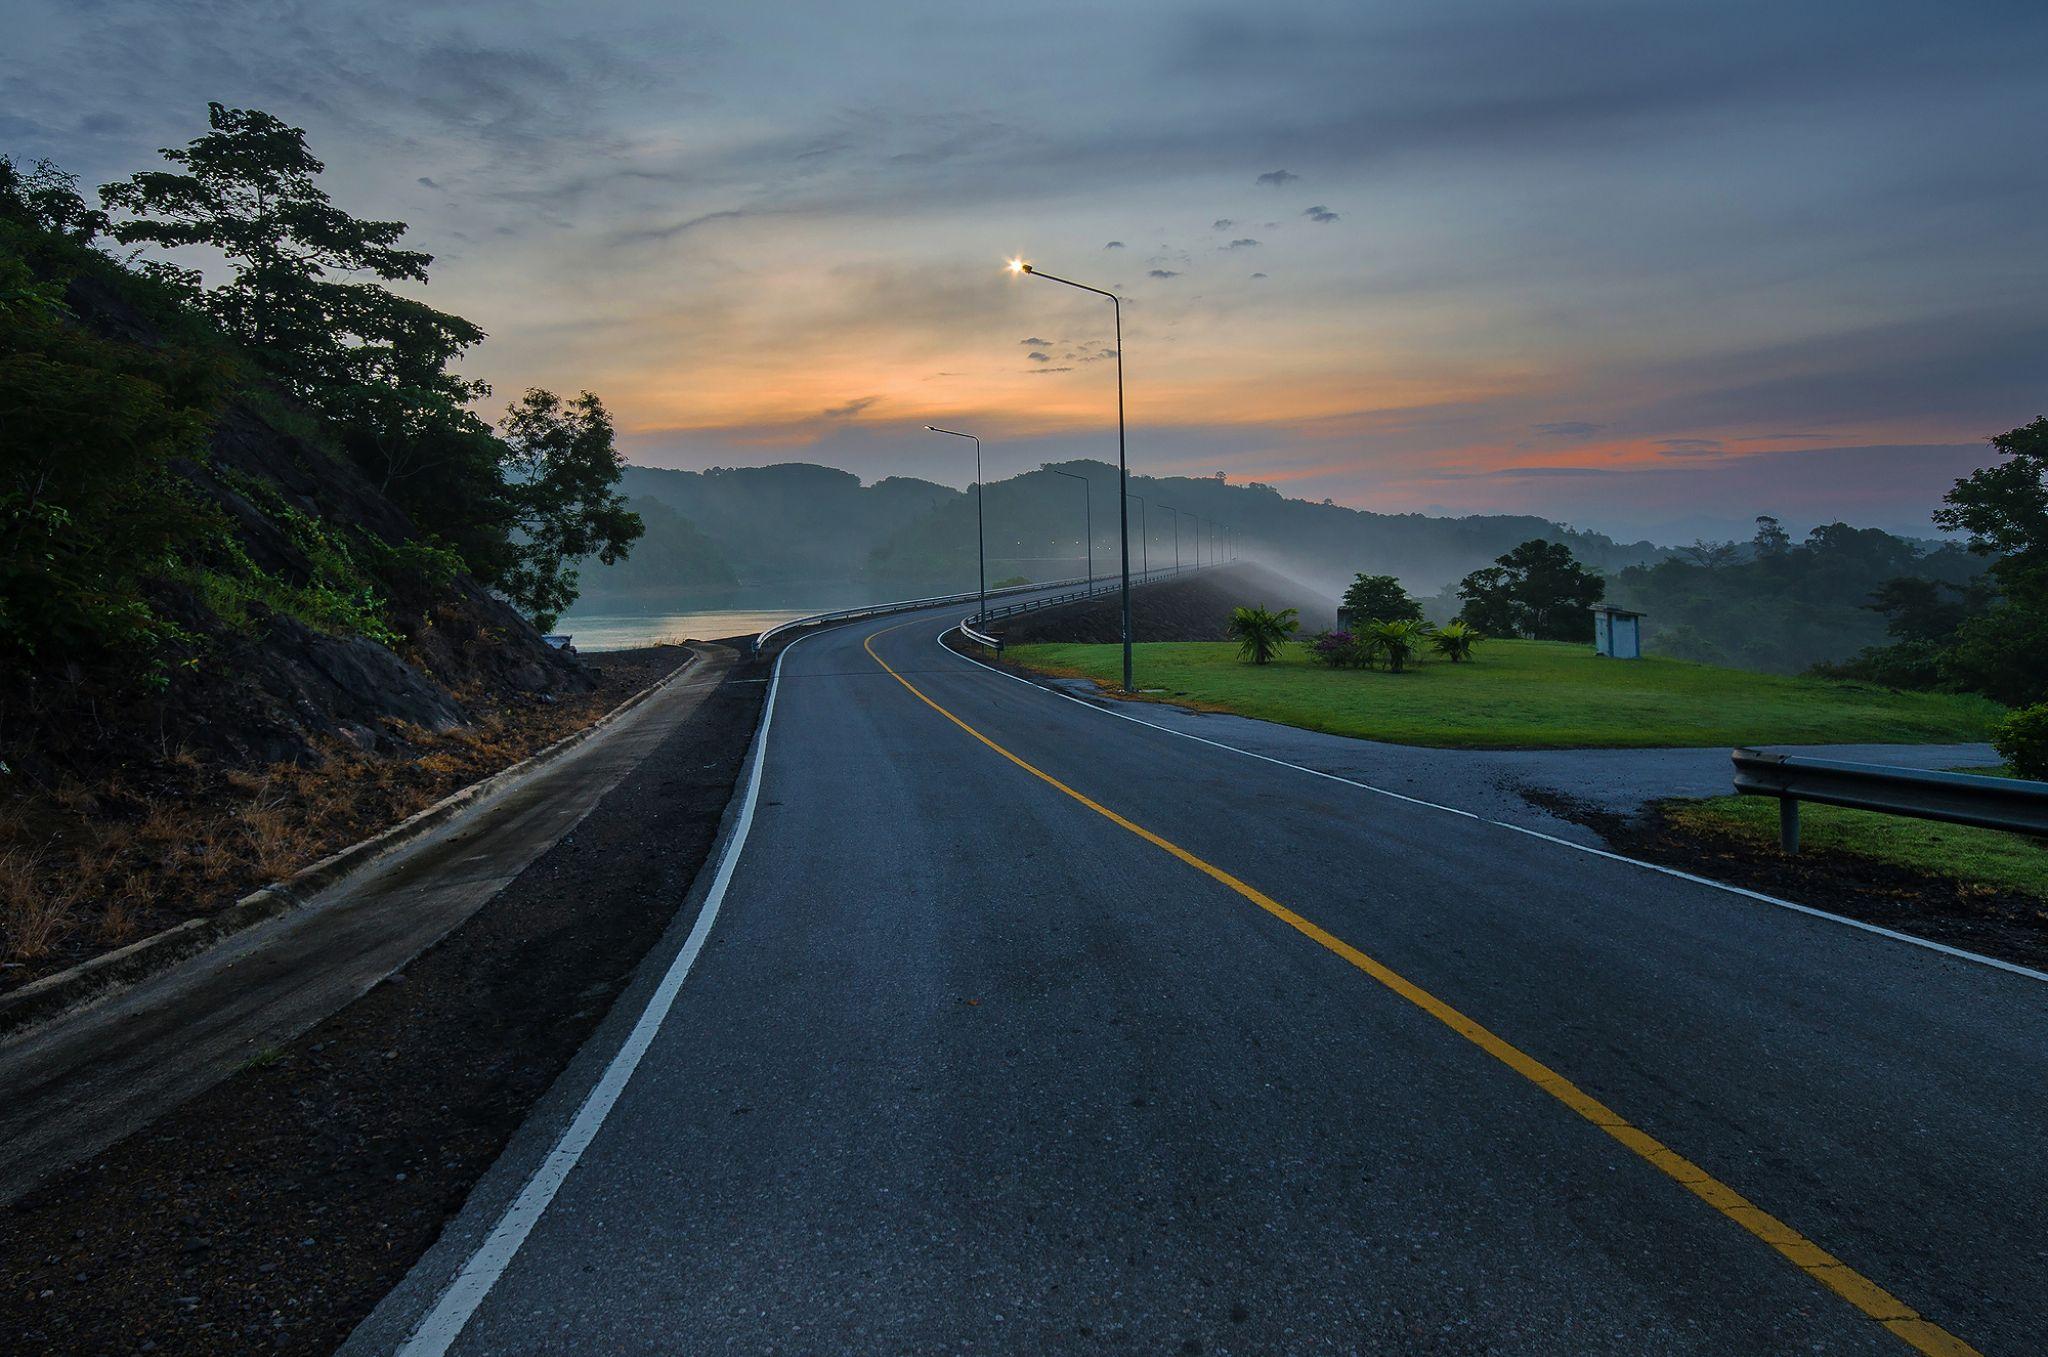 Road by darkcamera